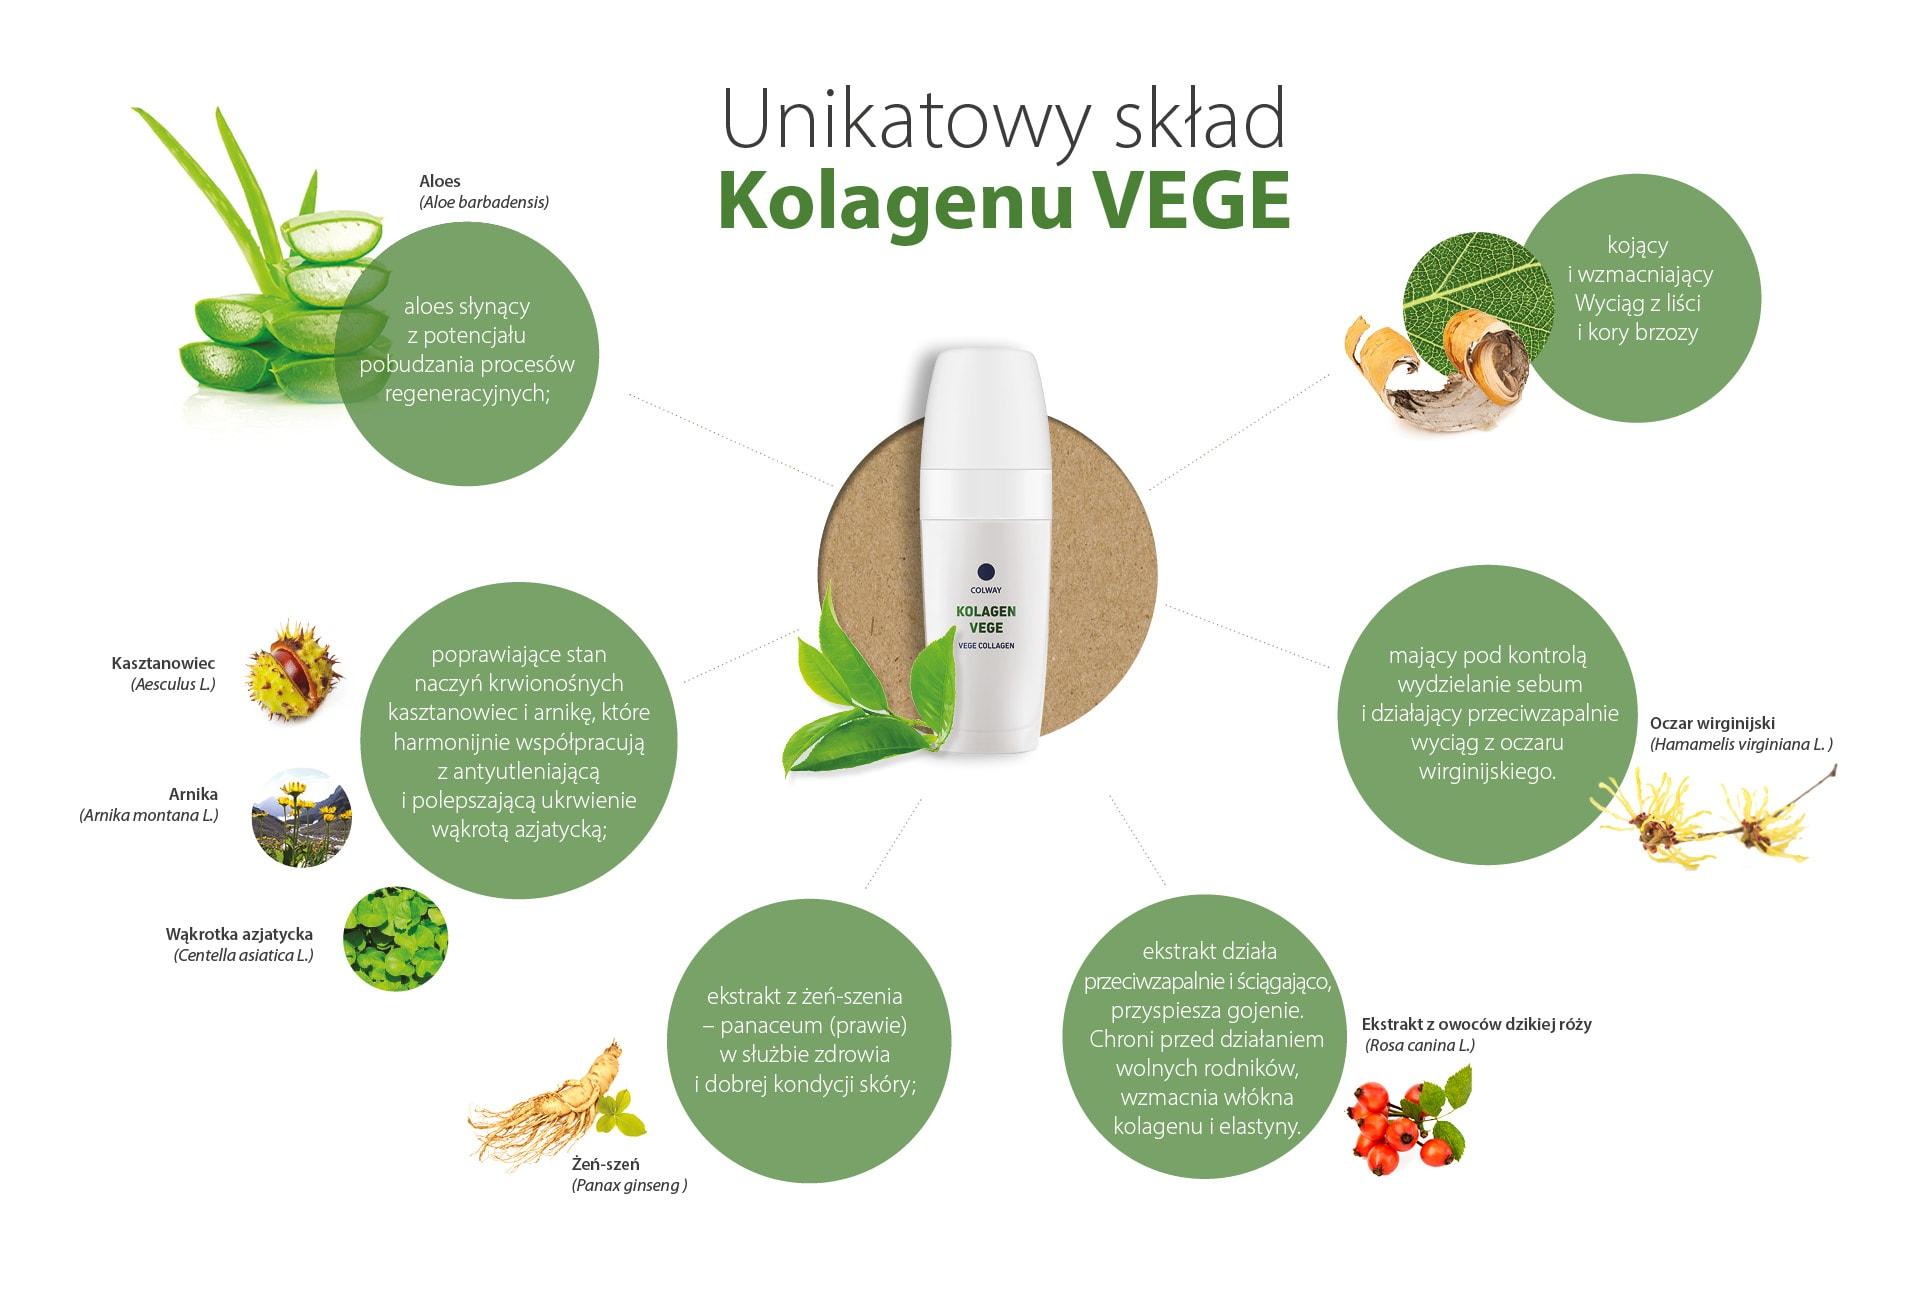 unikatowy skład kolagenu vege